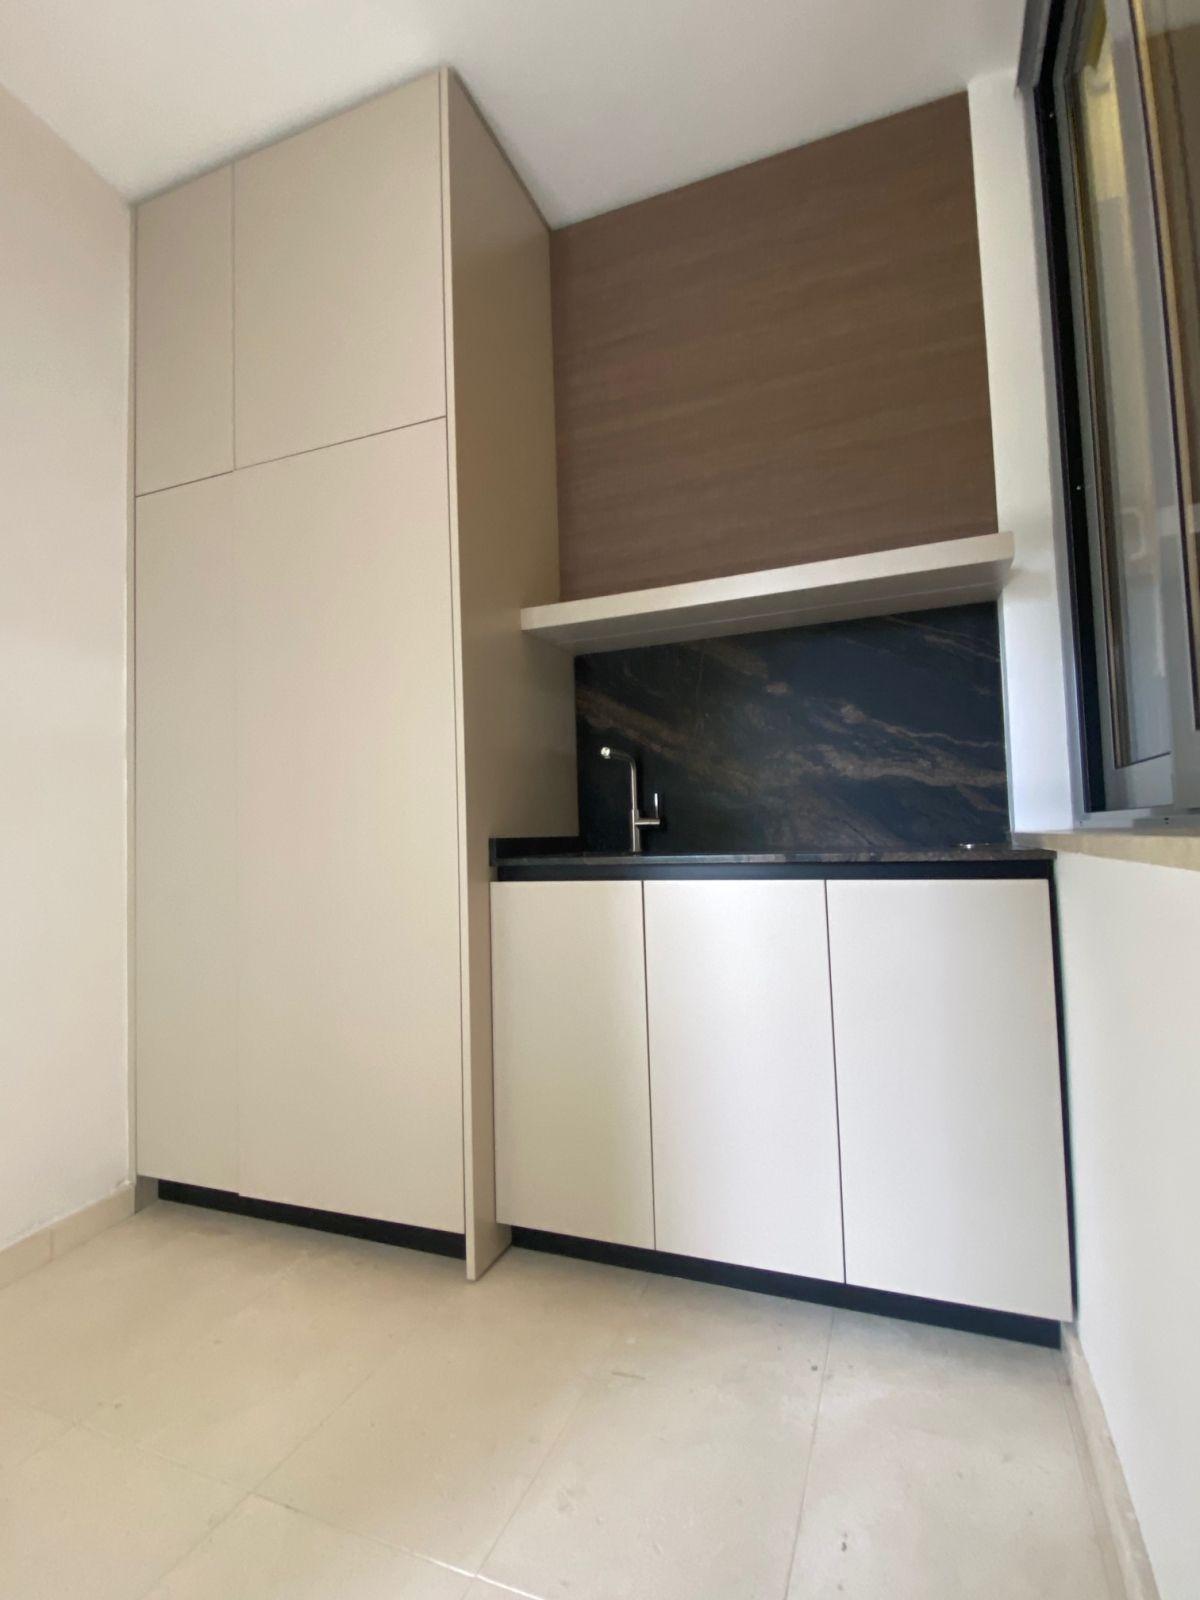 2 Bedroom Villa For Sale - Sierra Blanca